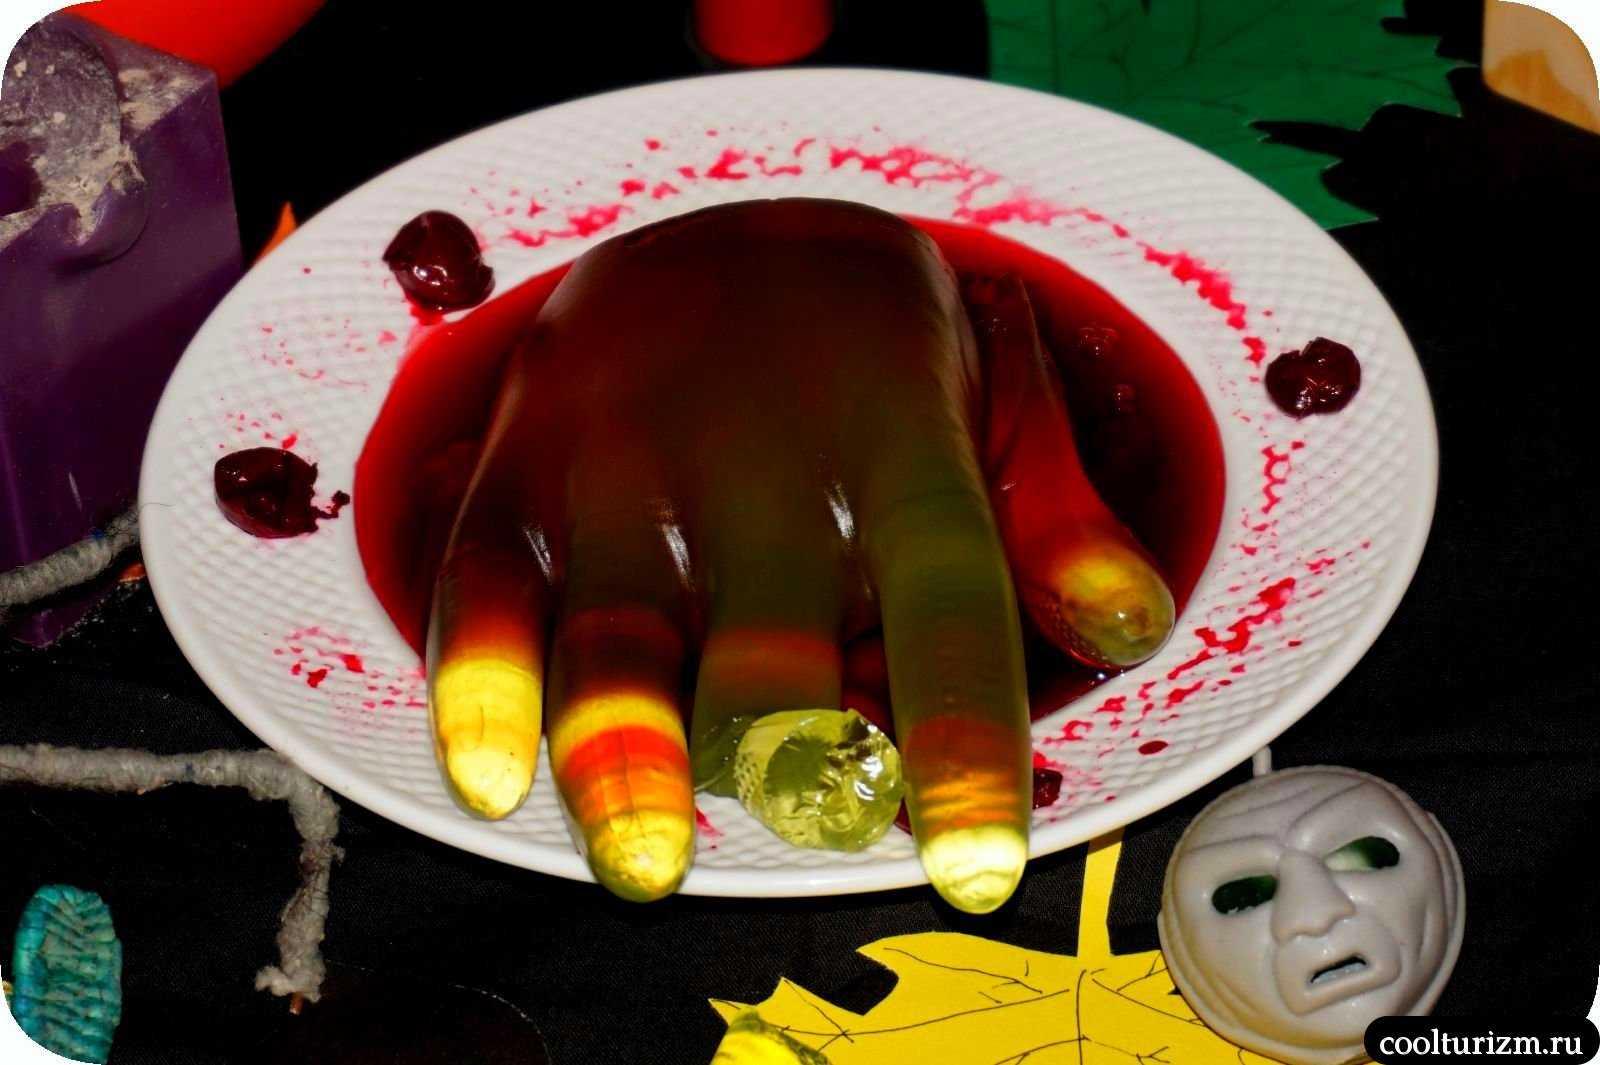 Рецепты блюд на праздник хэллоуин 2019: топ-10